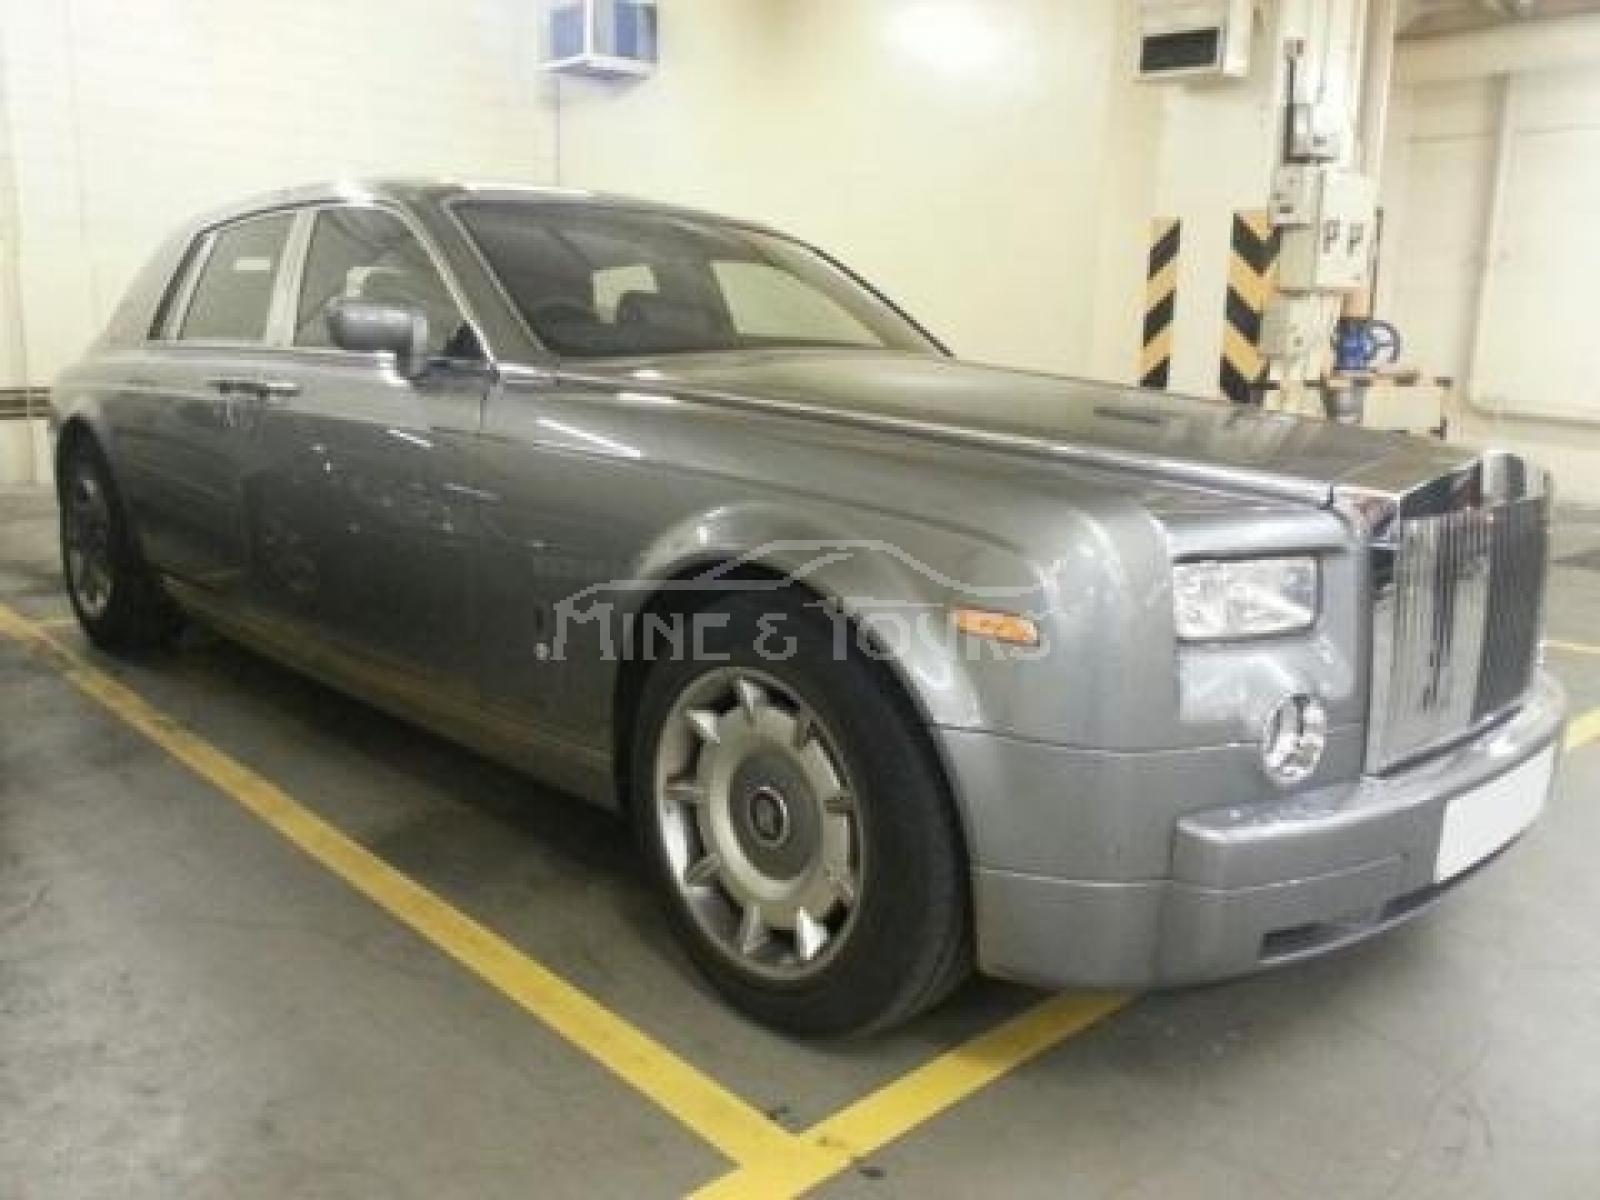 Rolls Royce Phantom (0683)